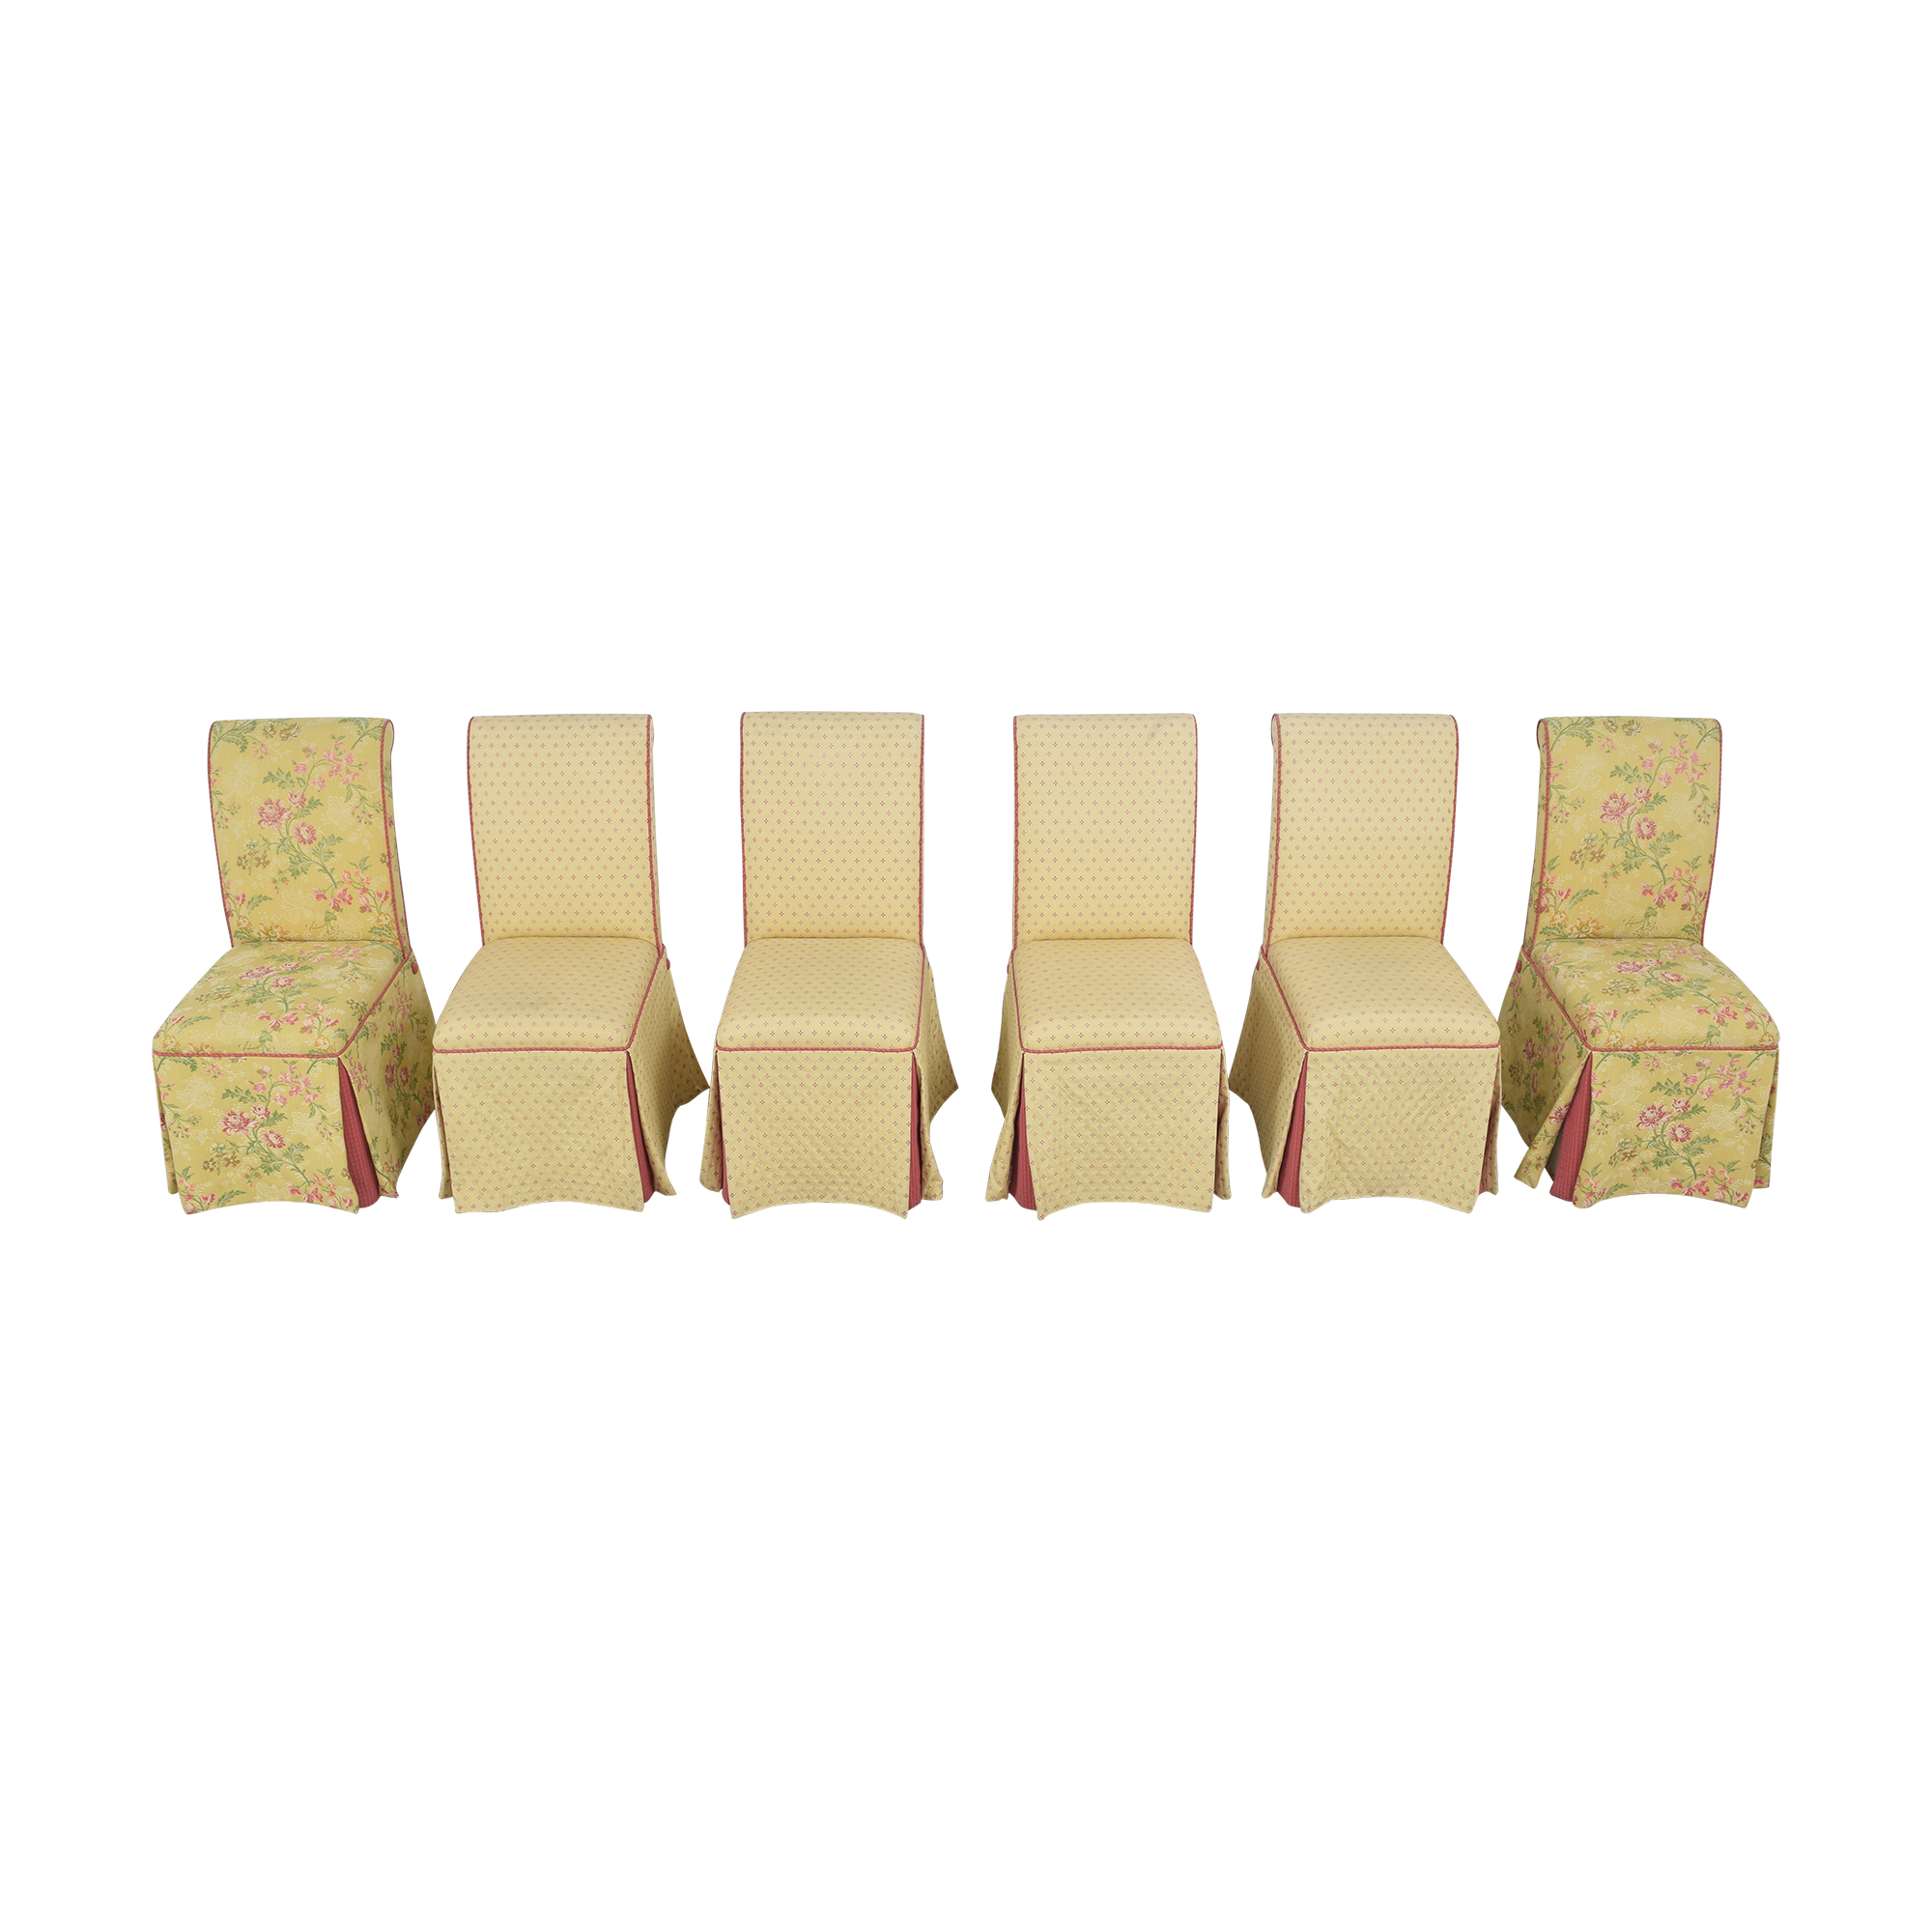 shop Custom Skirted Dining Chairs